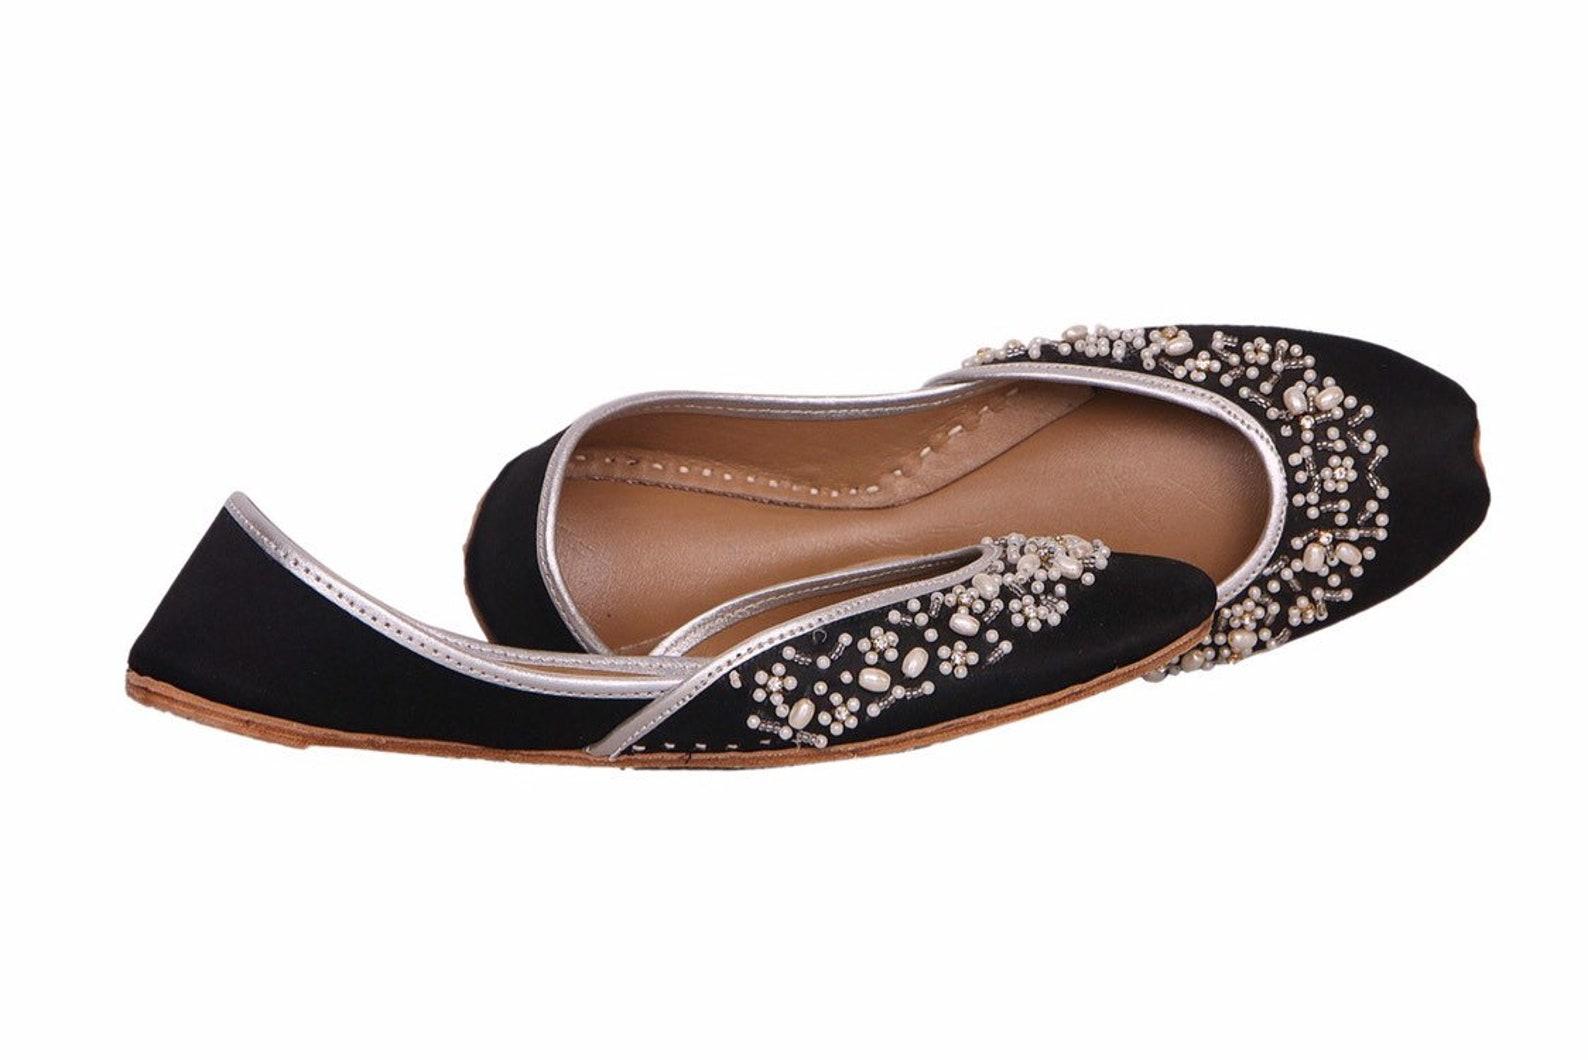 black base silver embellished ballet flat shoes black jutis black slip ons mojari black khussa